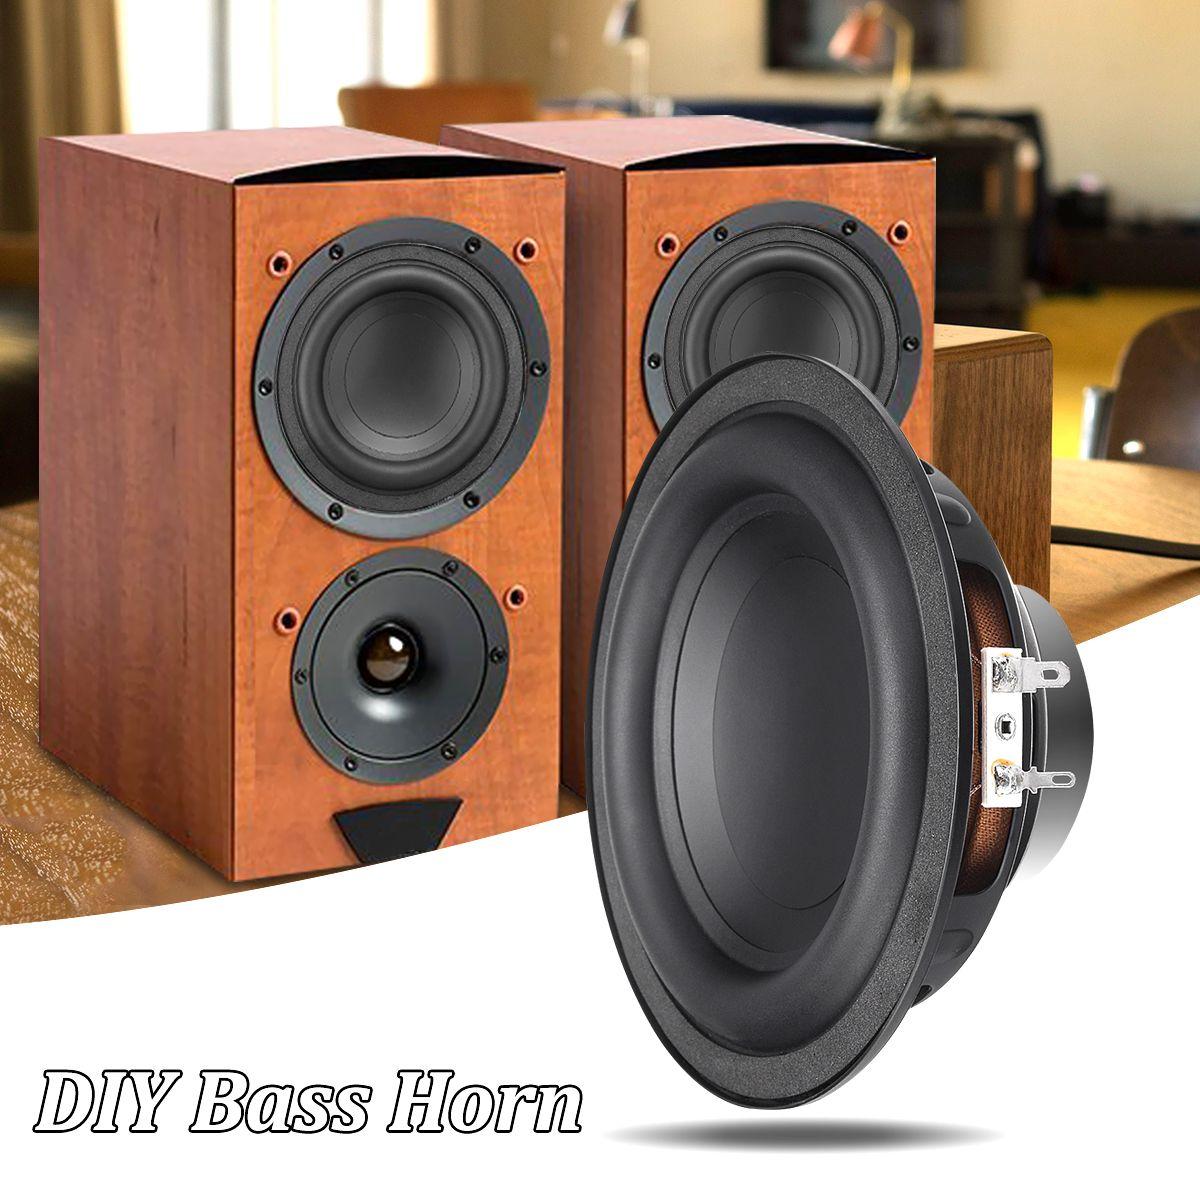 1pcs Subwoofer Speaker Unit 50W DIY Sound Box Loudspeaker Stereo Subwoofer Speaker Strong Bass Horn Speaker Accessories Trumpet